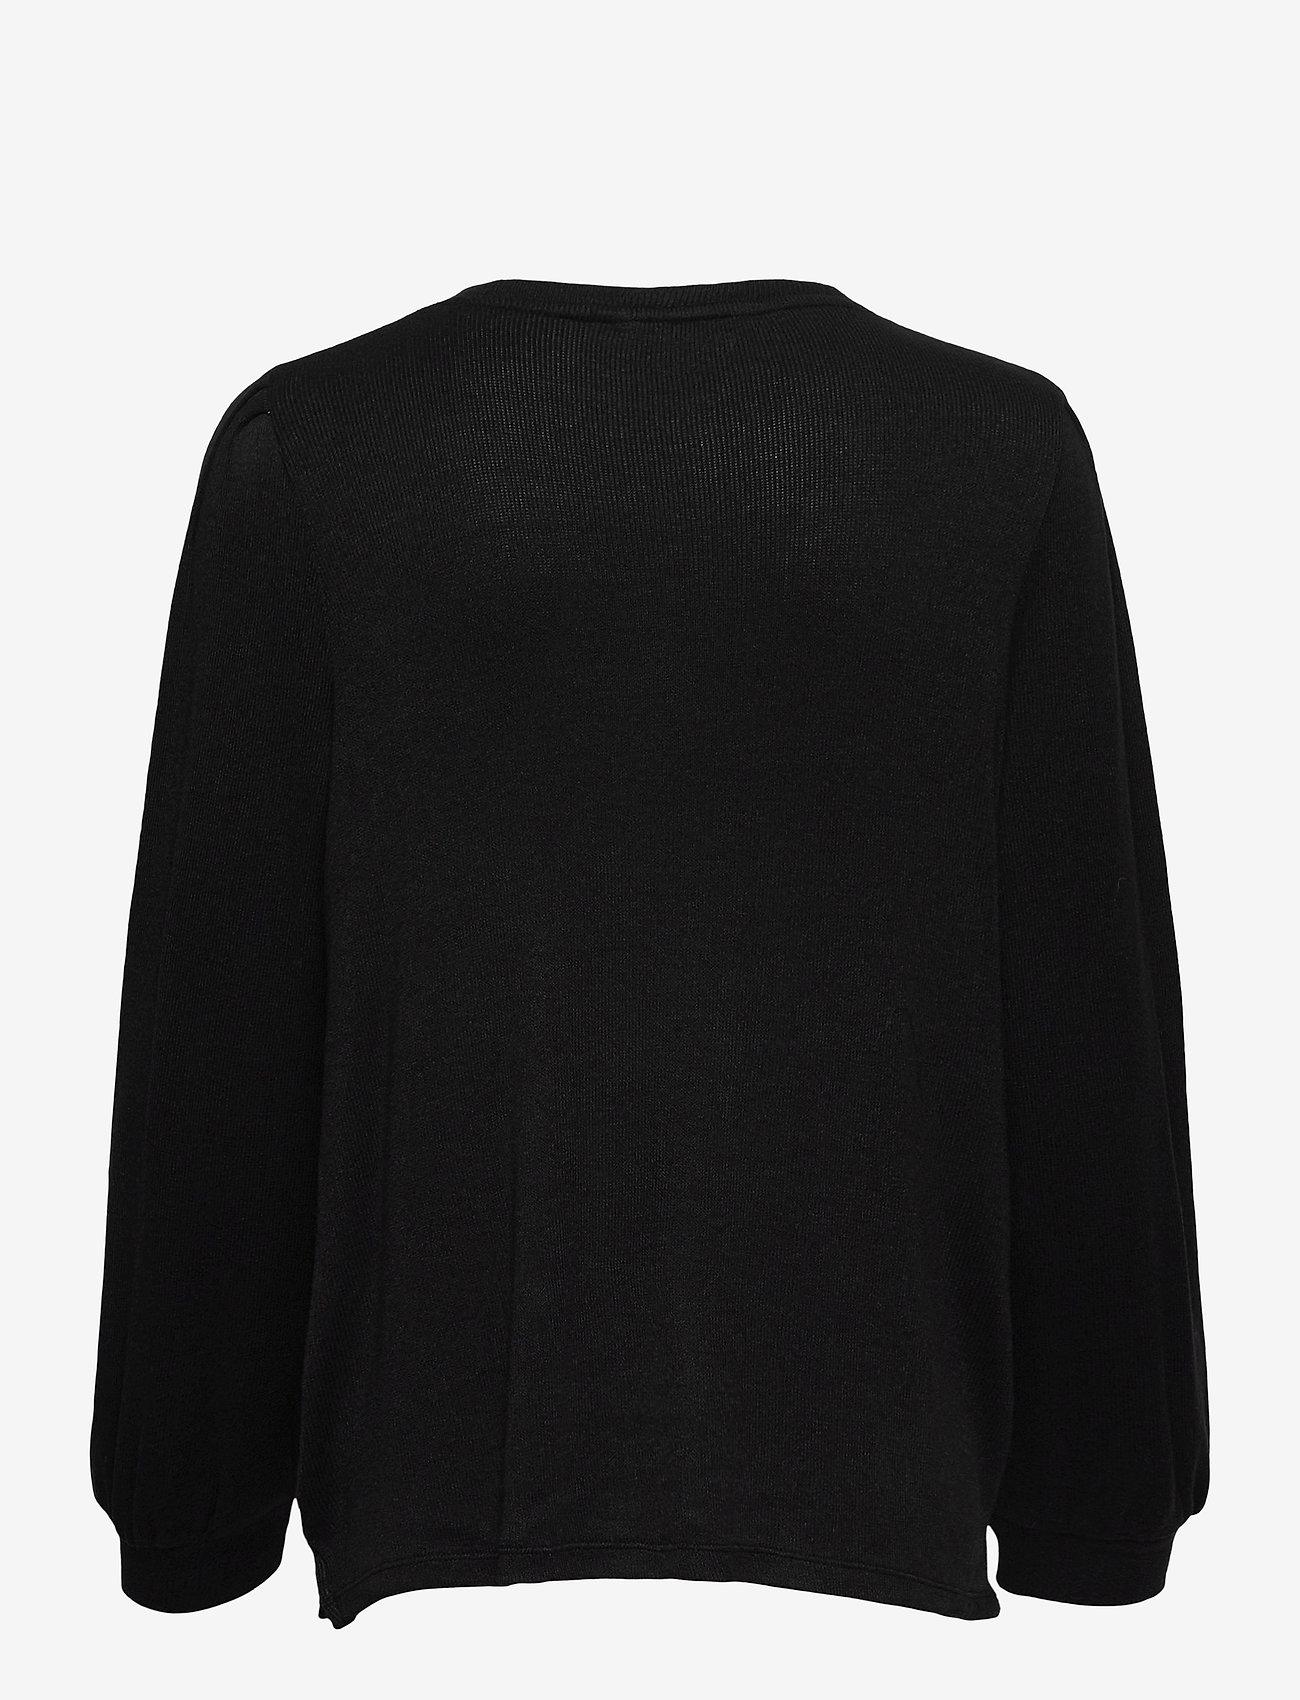 Banana Republic - Cozy Ribbed Puff Sleeve Top - long-sleeved tops - black - 1